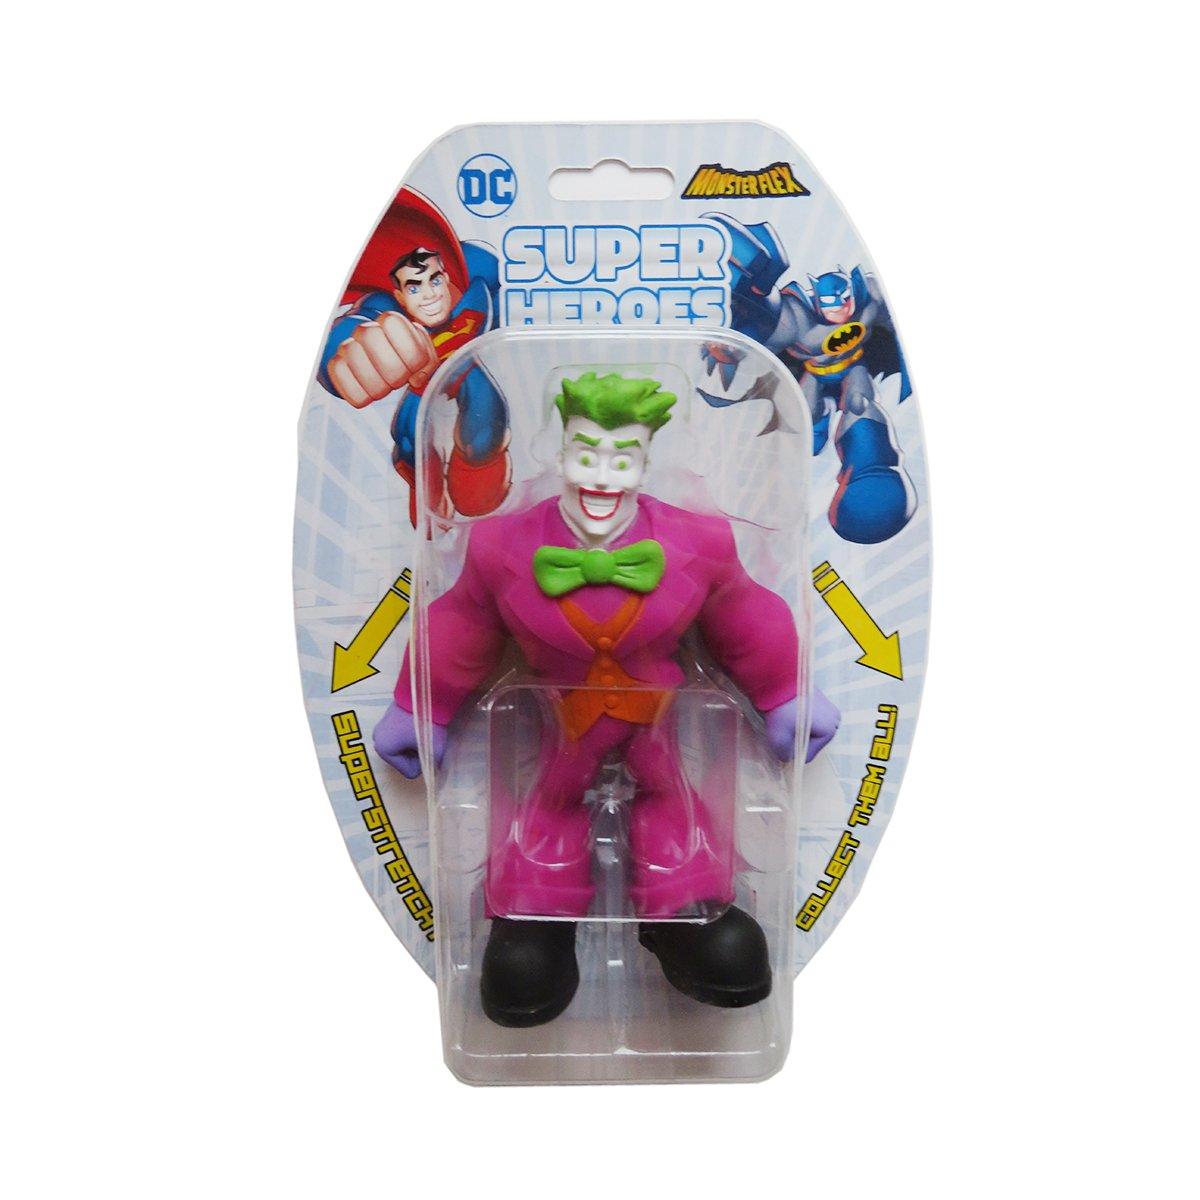 Figurina flexibila Monster Flex, DC Super Heroes, The Joker